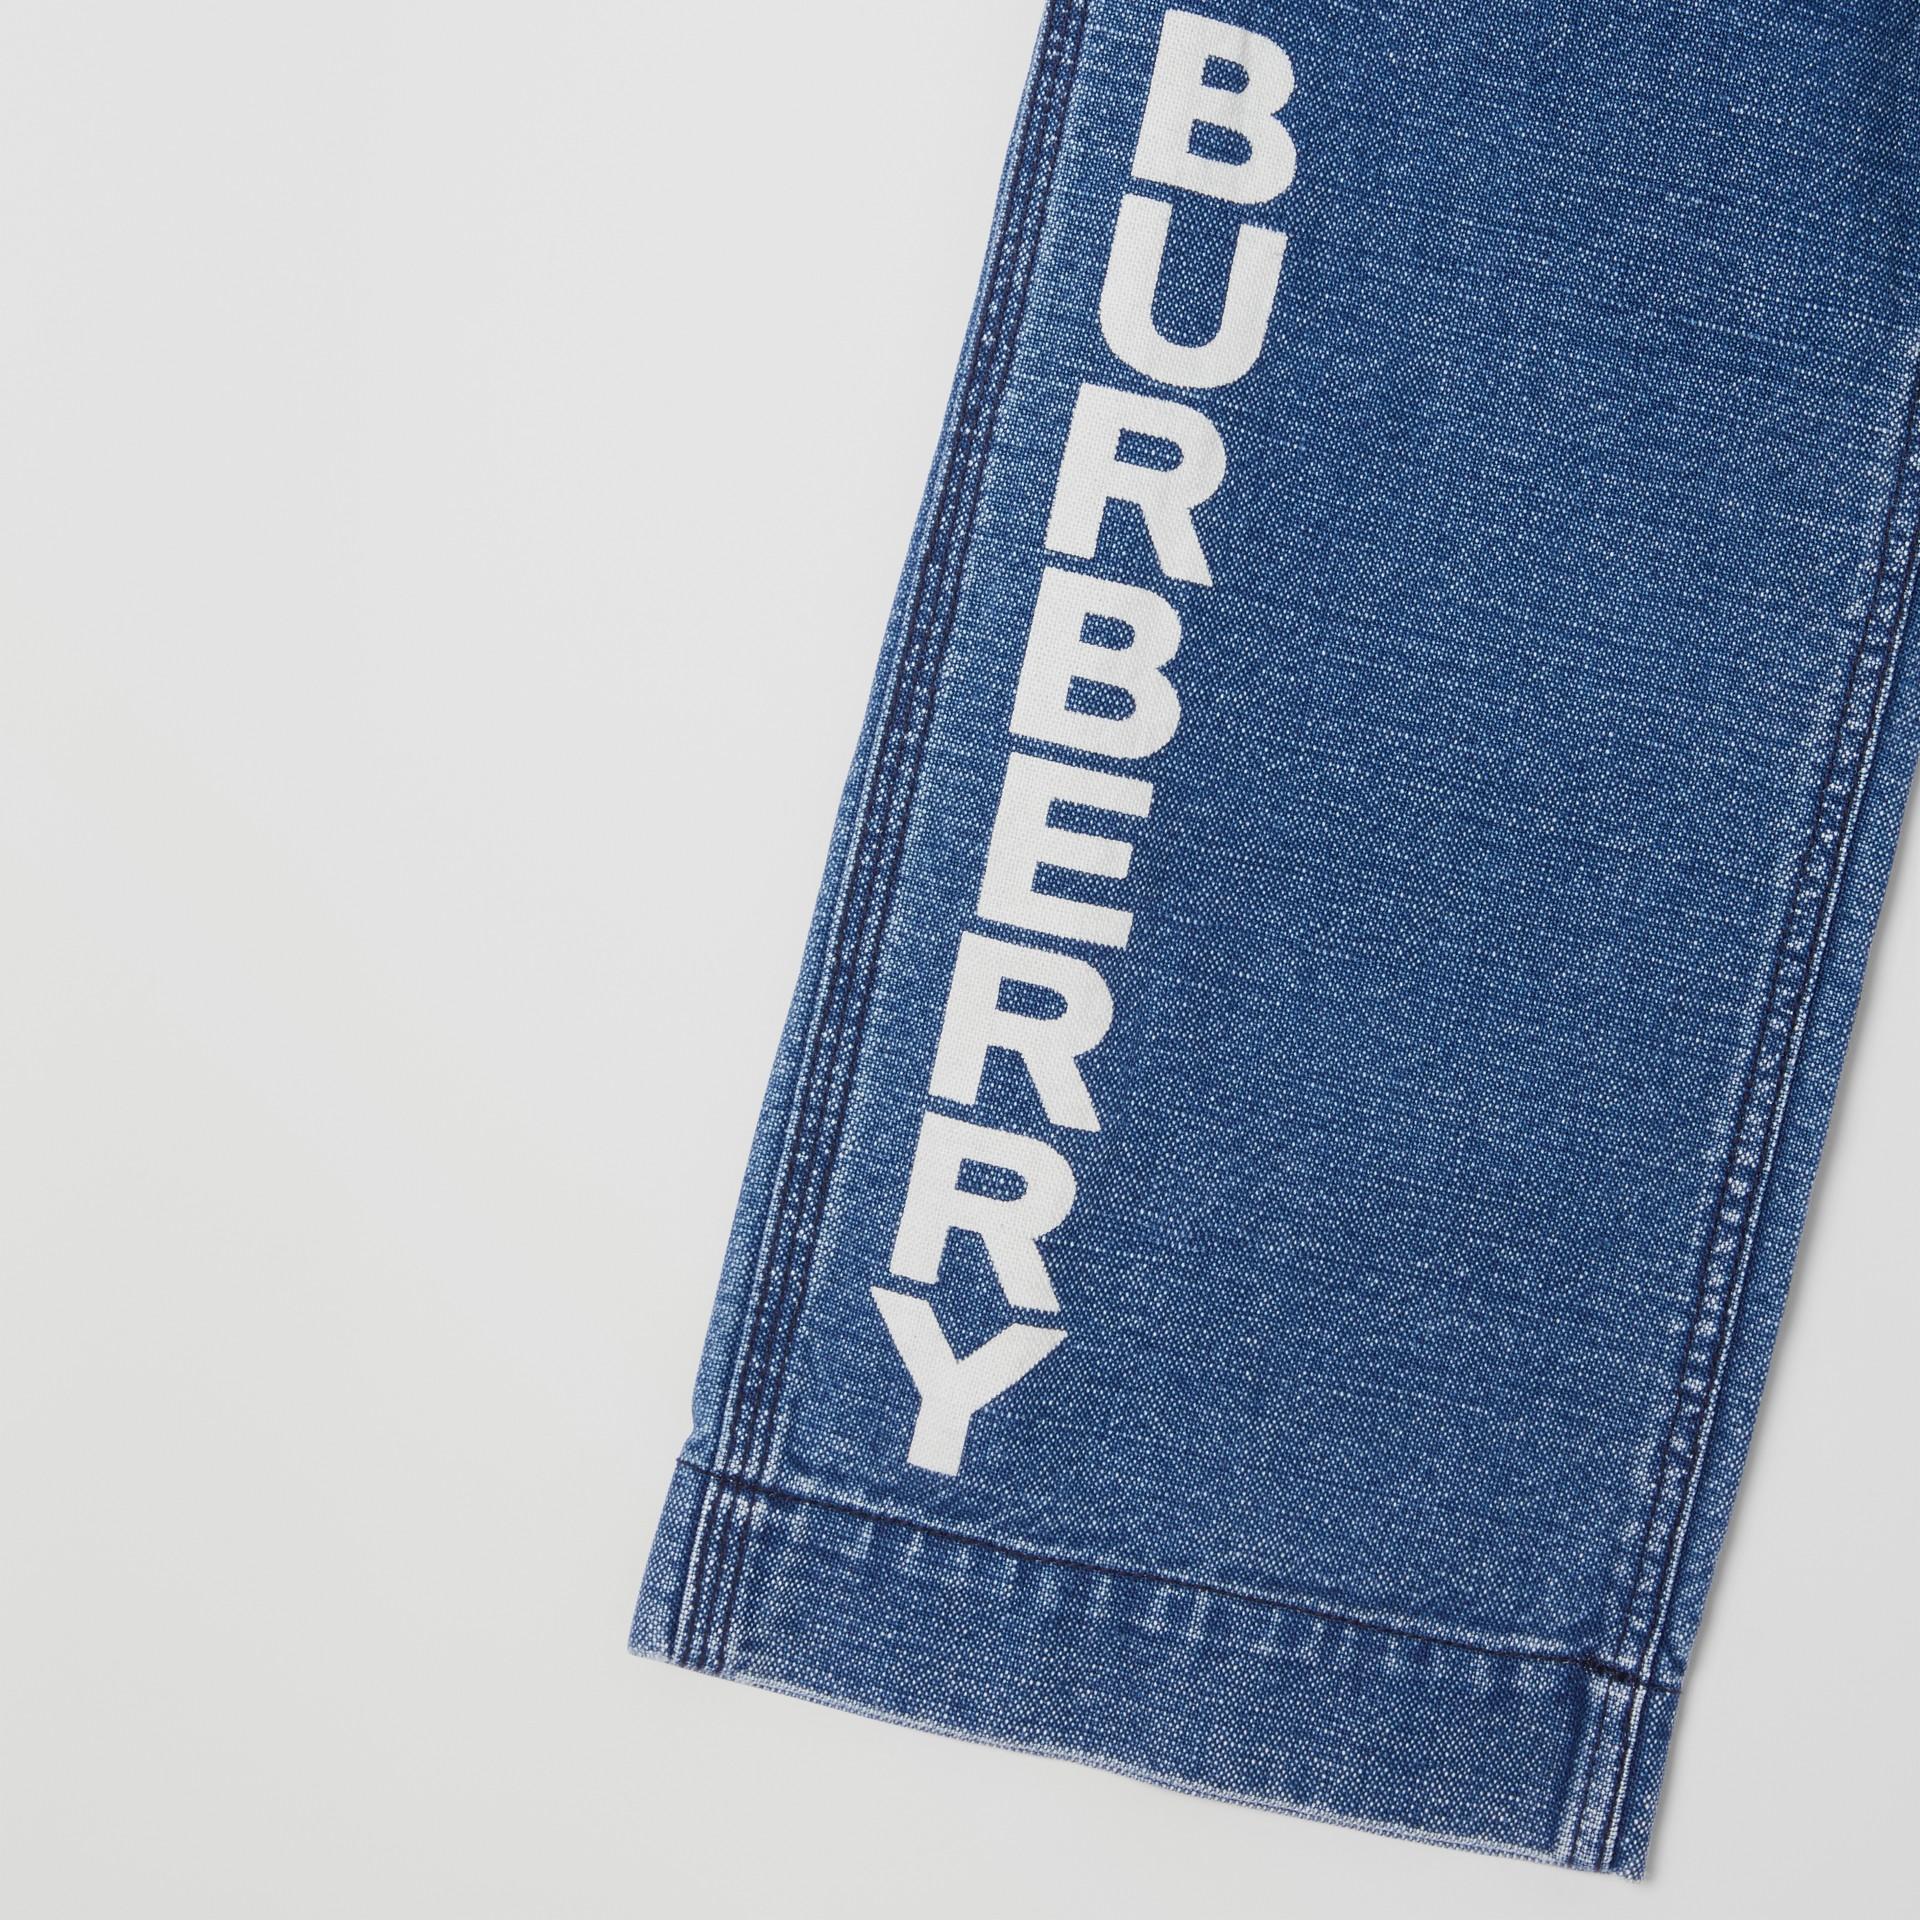 Logo Print Japanese Denim Jeans in Indigo - Girl   Burberry - gallery image 4